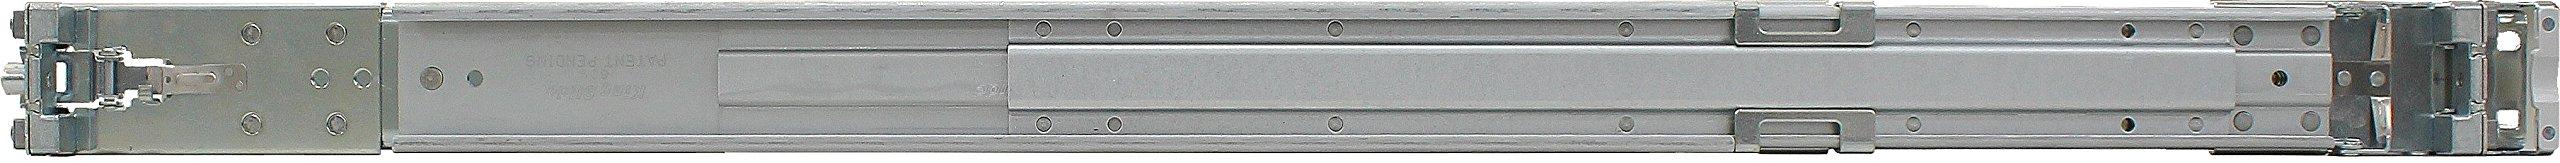 Synology Sliding Rail for 1U/2U Models (RKS1317) by Synology